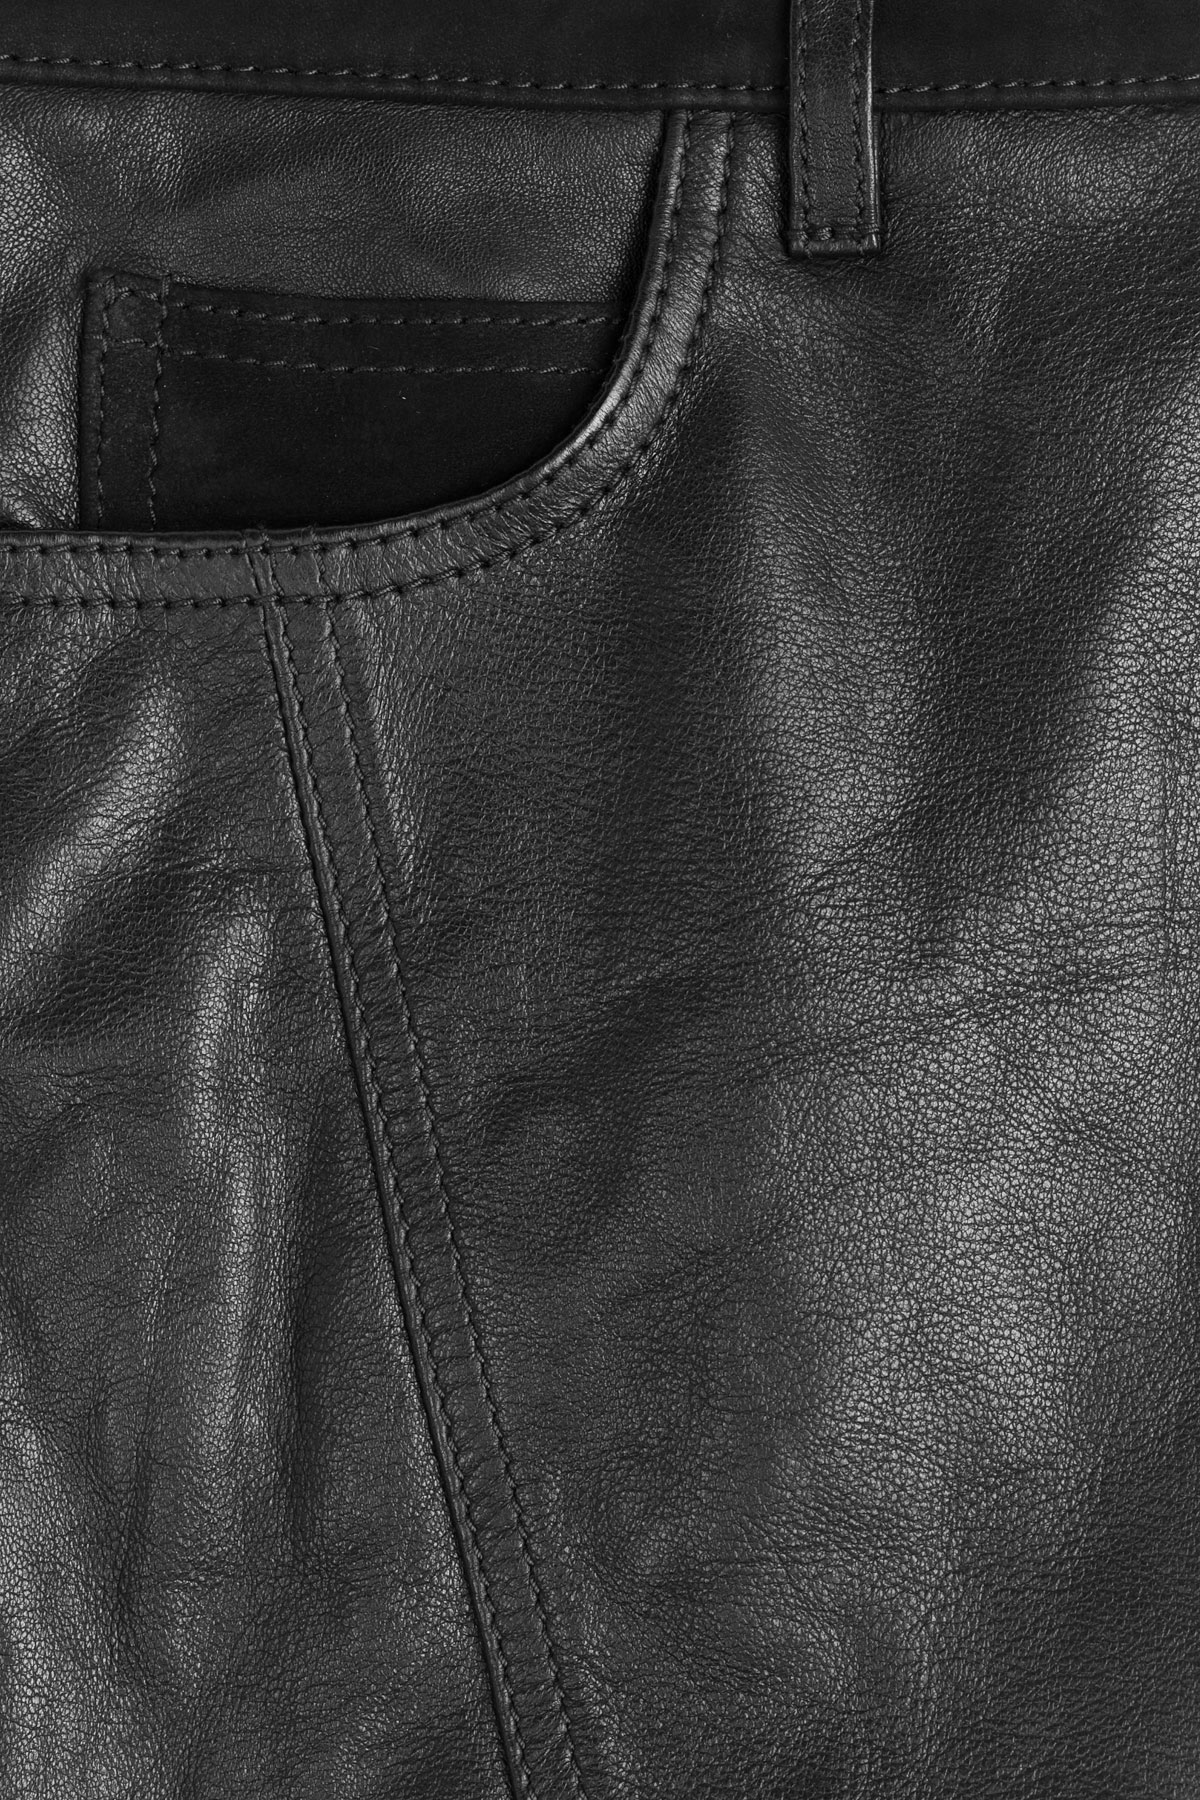 28b8668d7d9c0b Burberry Brit Lamb Leather Pencil Skirt - Black in Black - Lyst